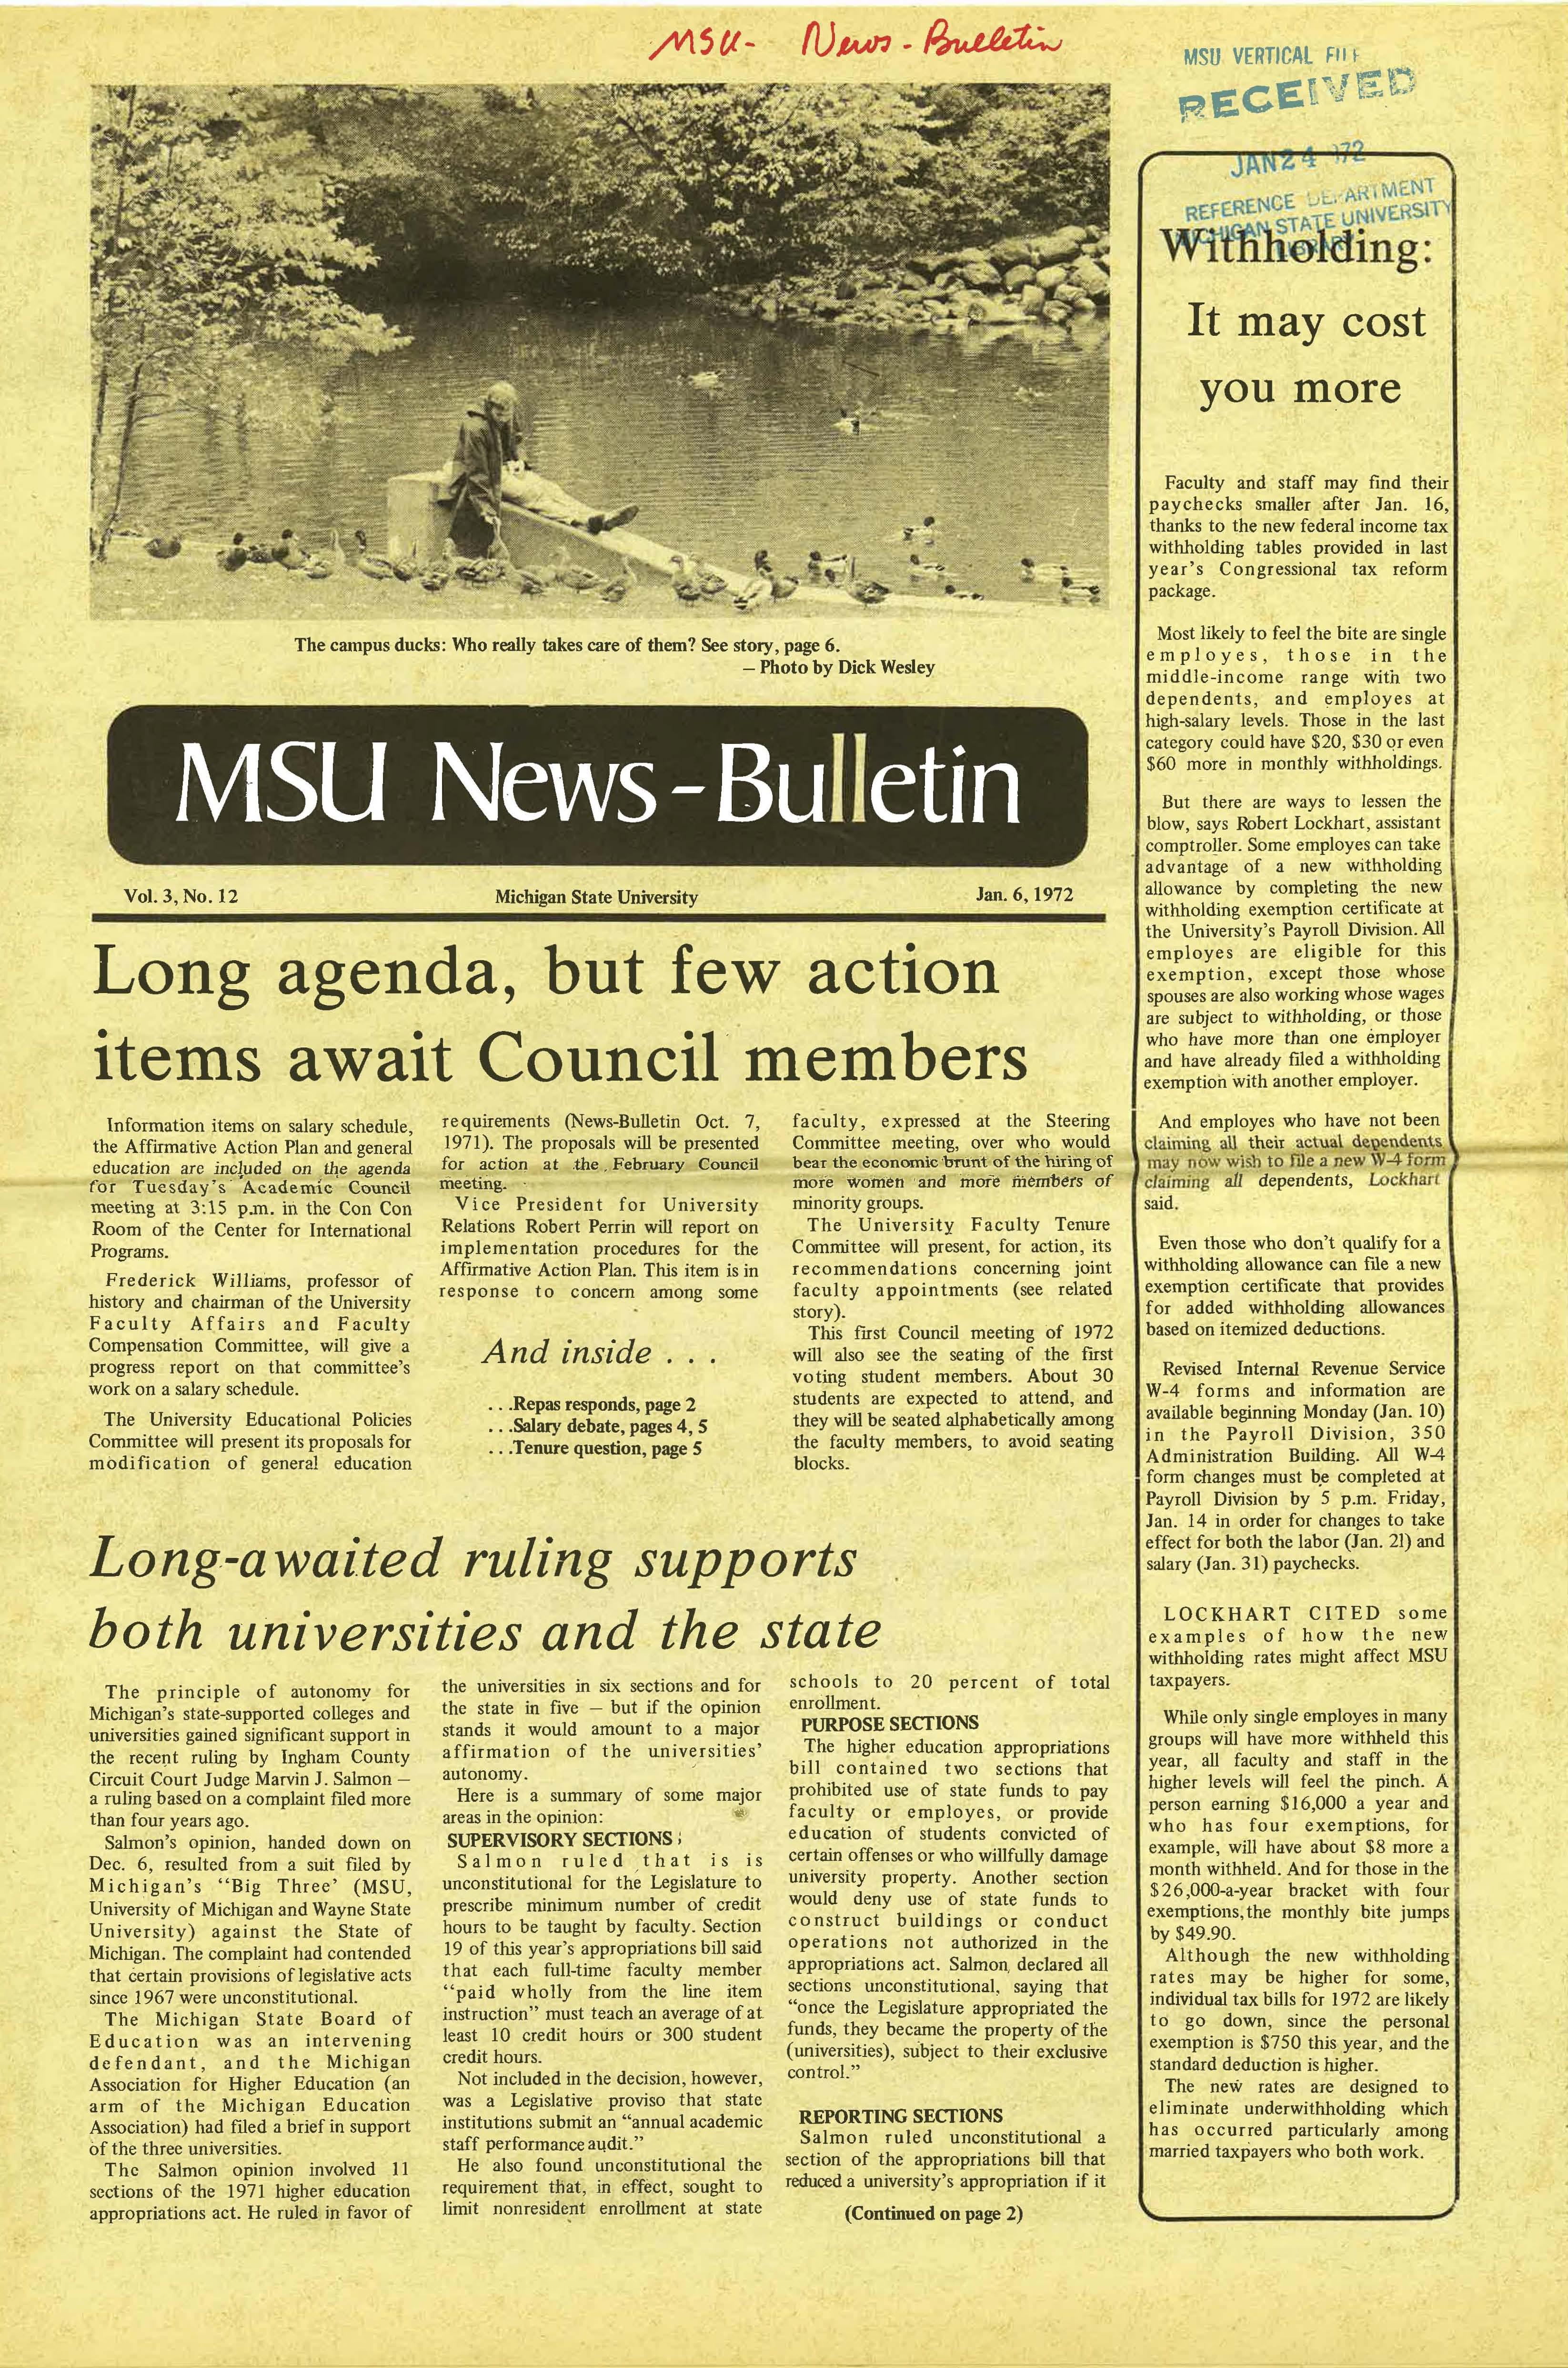 MSU News Bulletin, vol. 3, No. 19, February 24, 1972